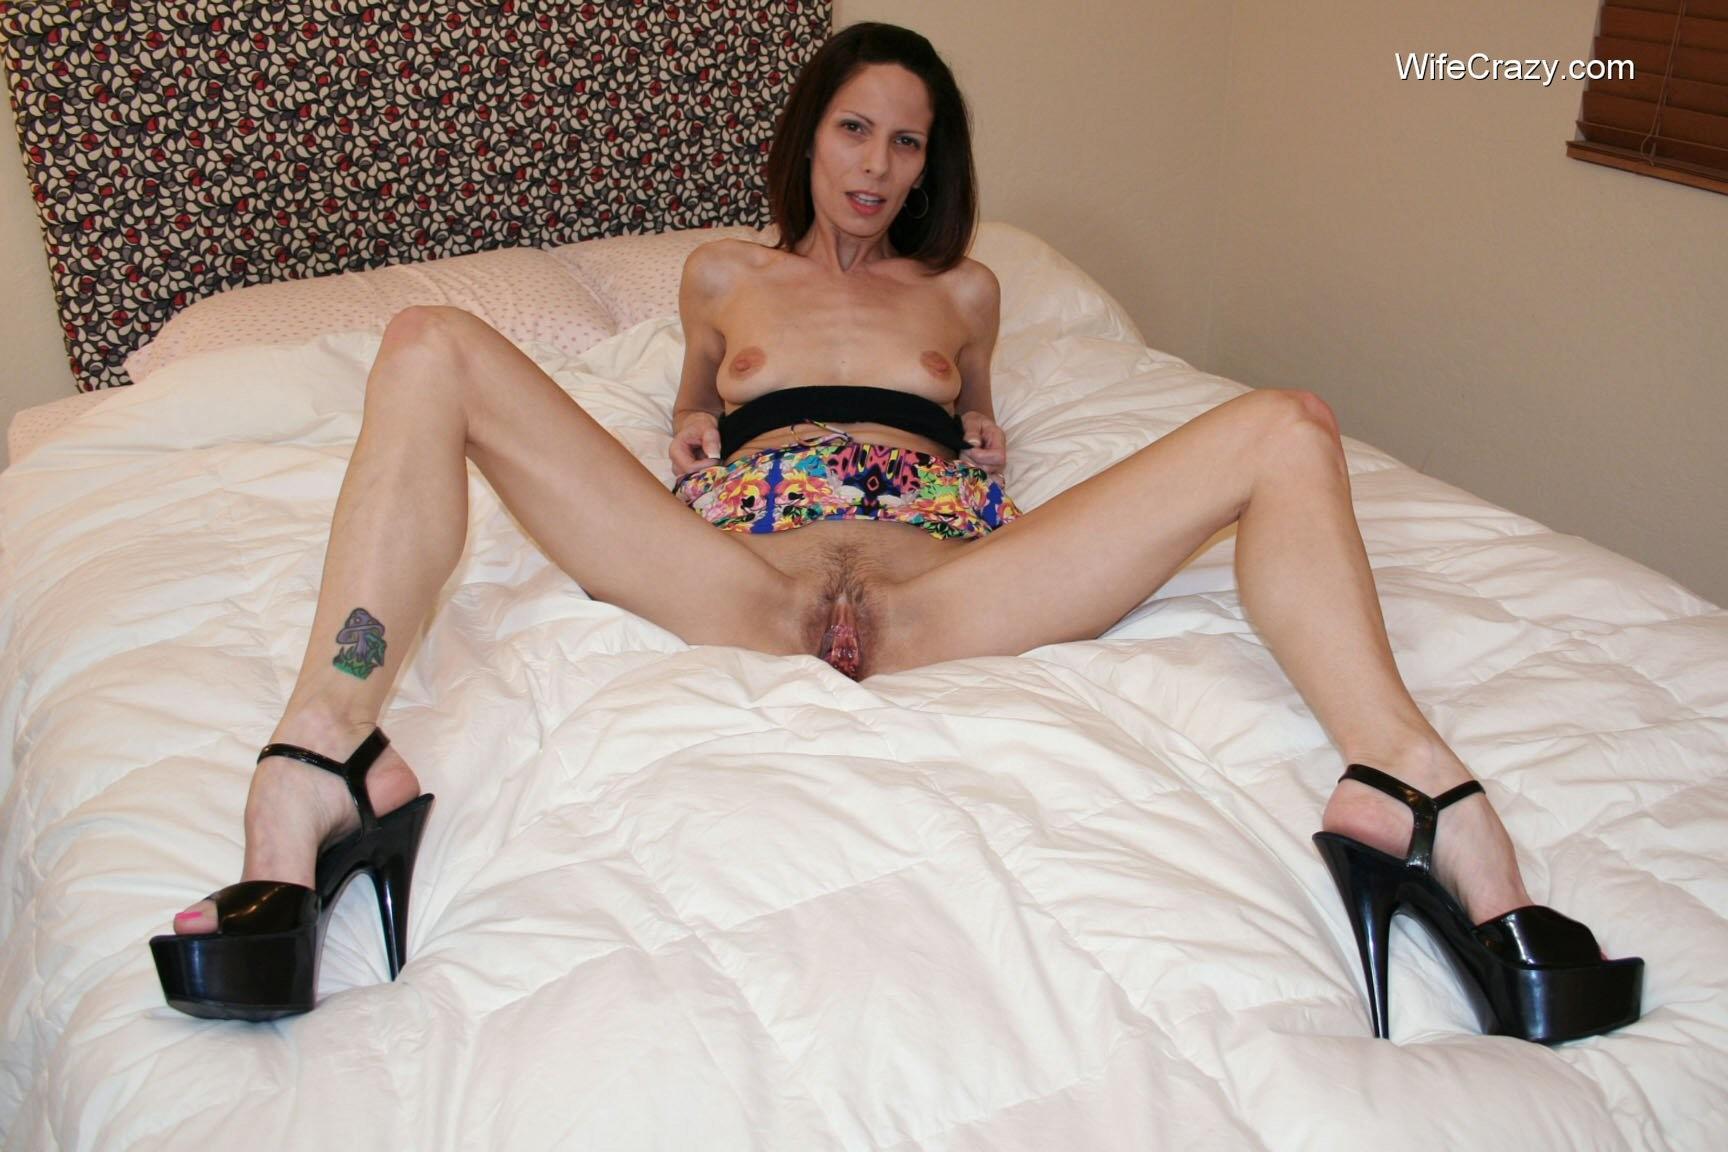 жена мастурбирует в кровати - 8